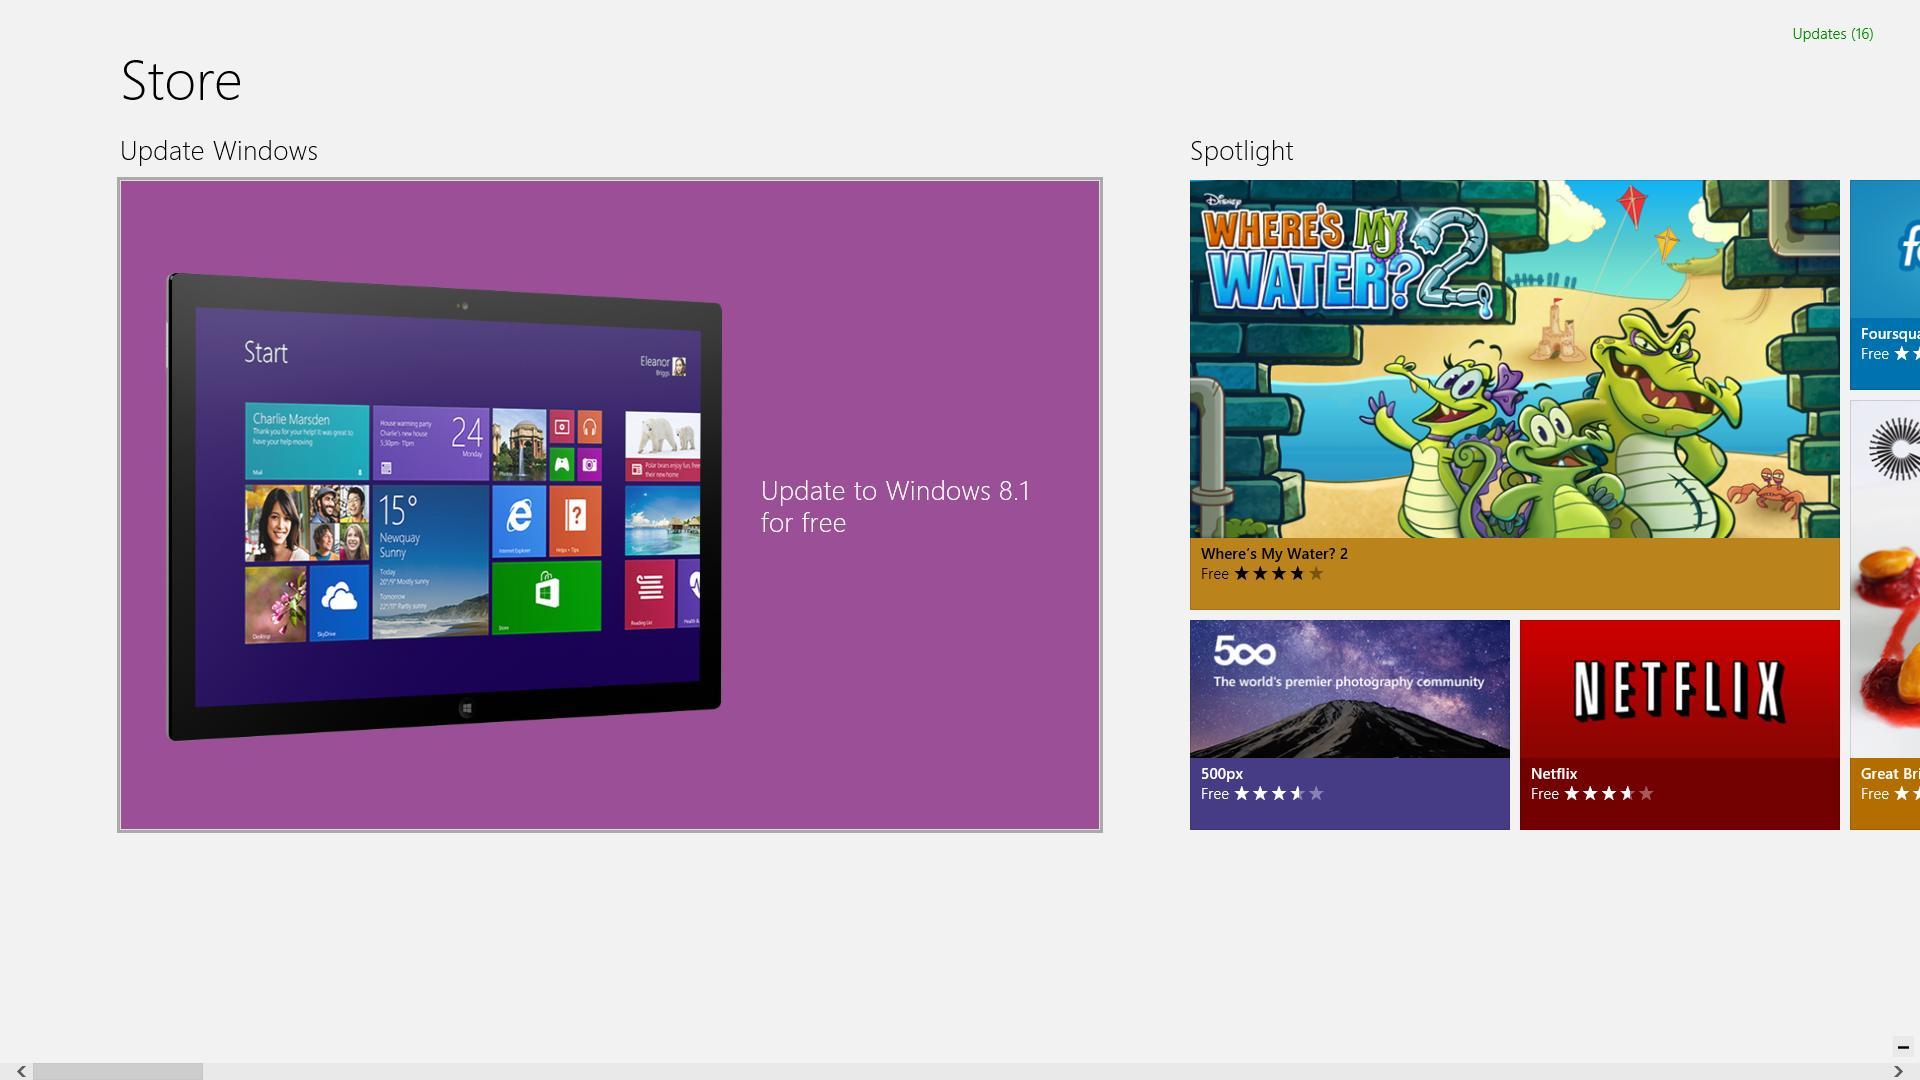 Windows 8 1 Installation Fails With Blank Black Screen